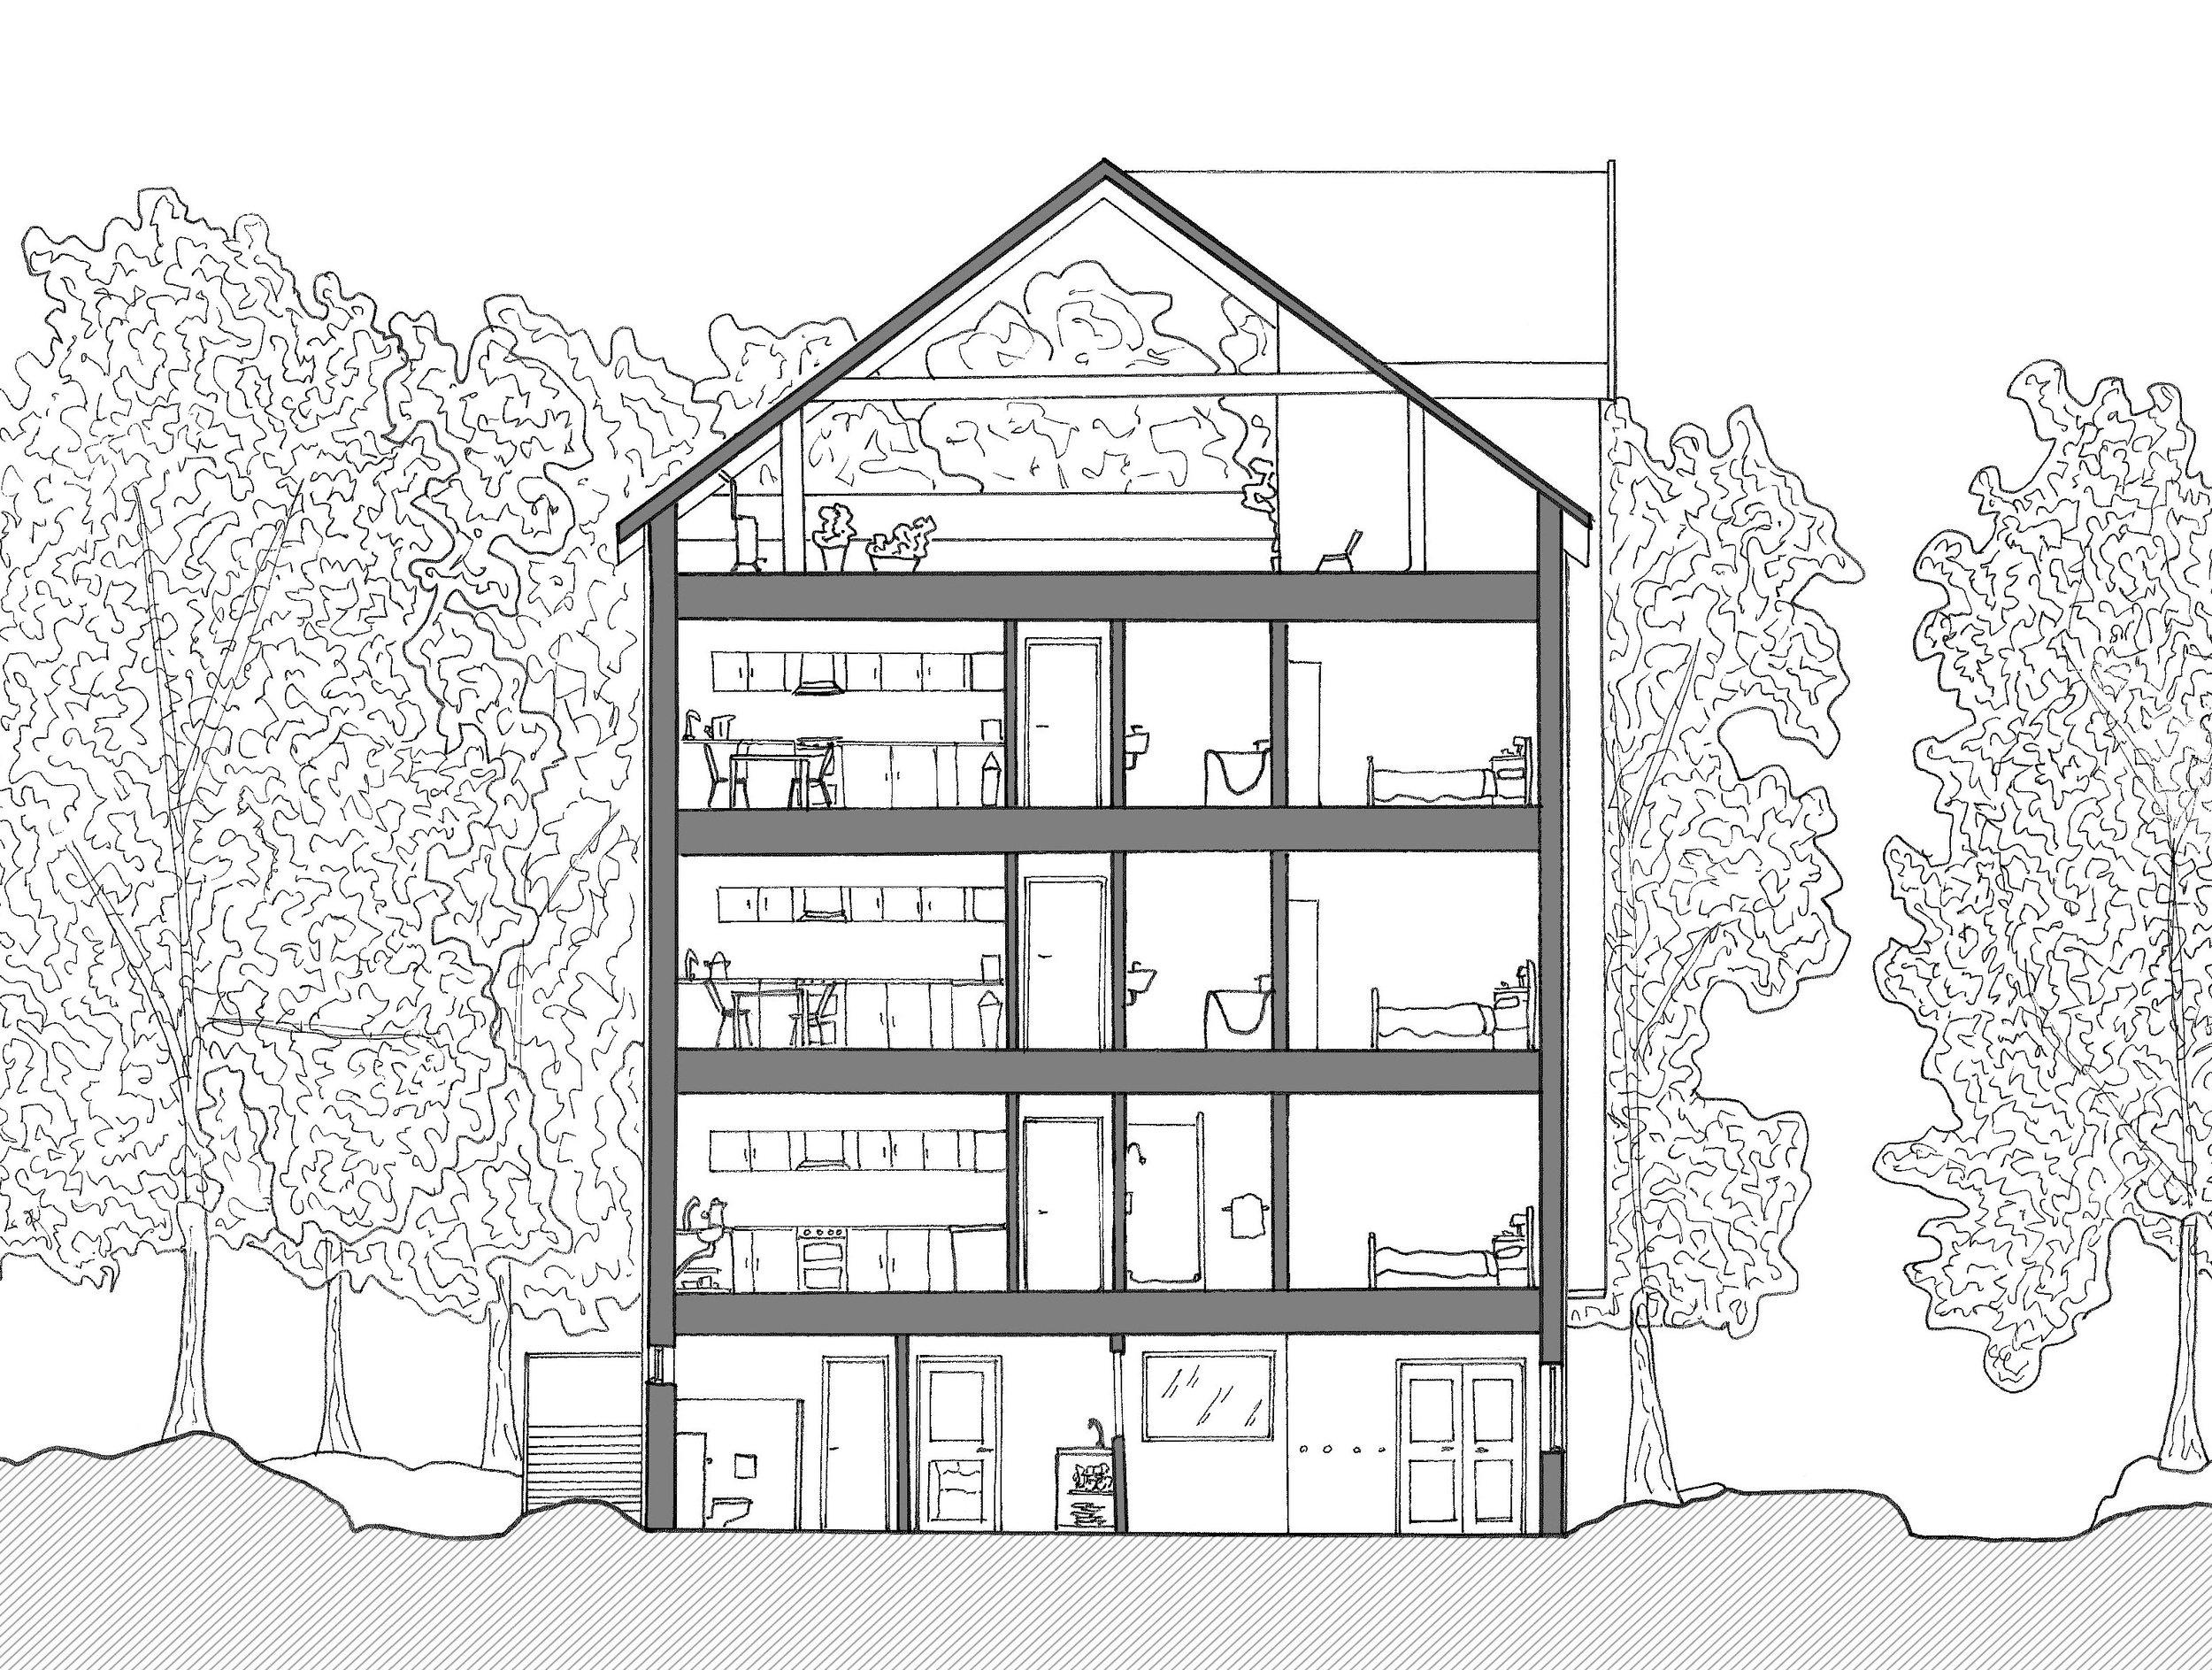 Orthographics - Faversham Creek Housing